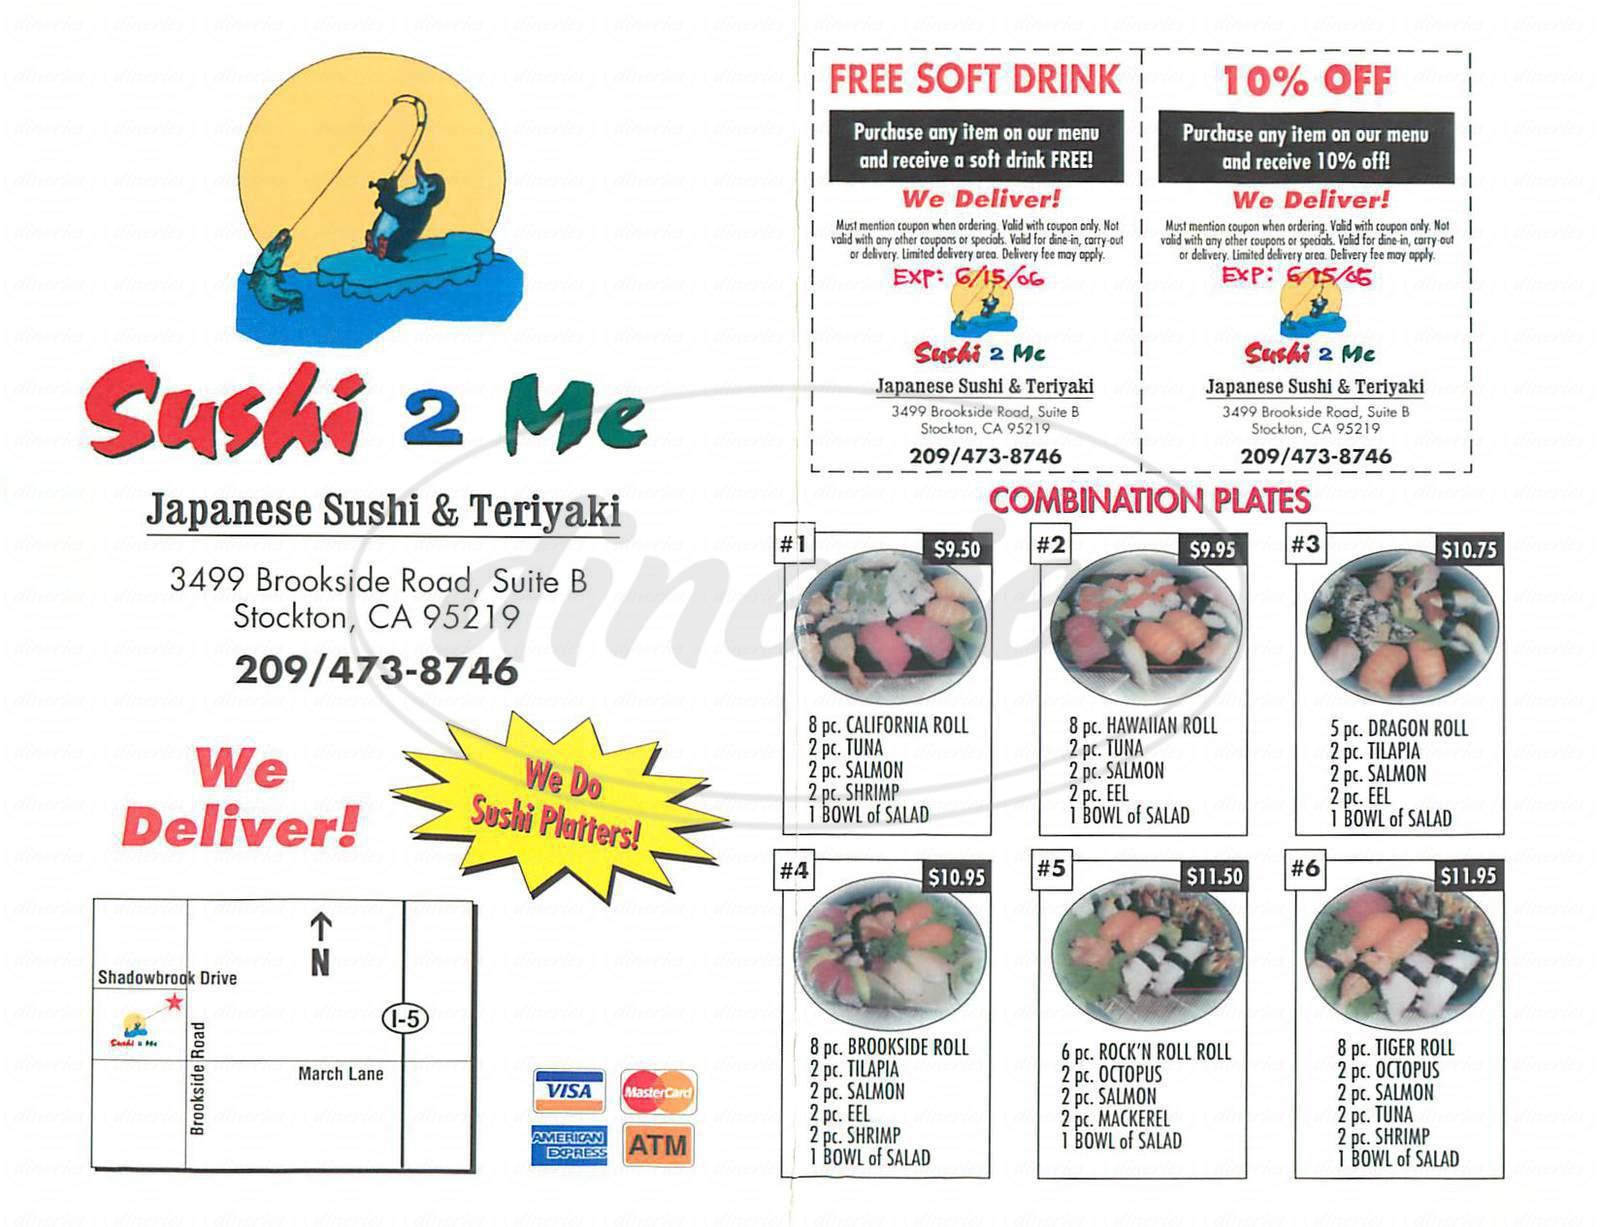 menu for Sushi 2 Me